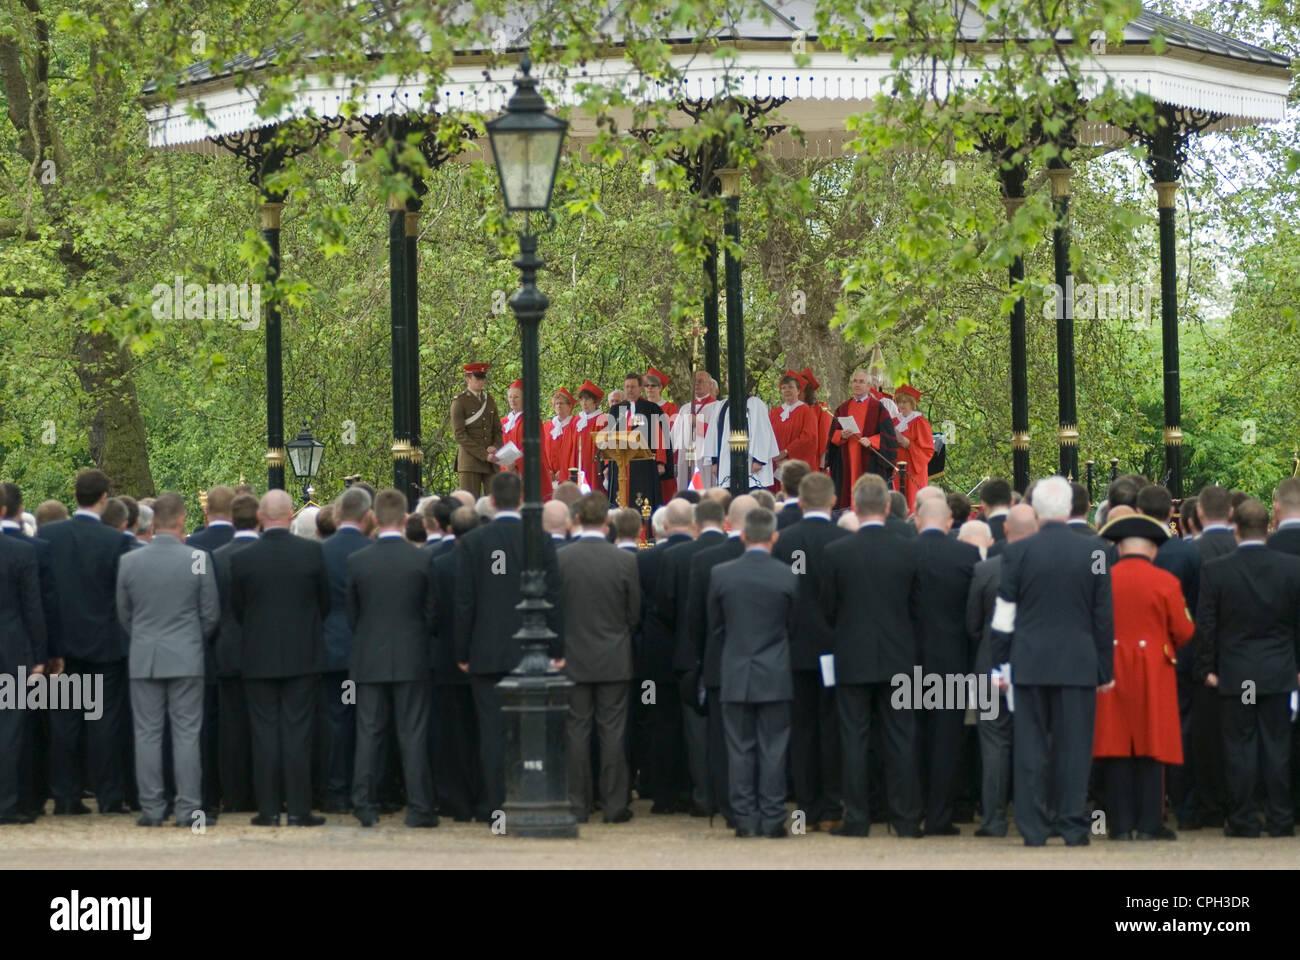 Asociación de antiguos camaradas de Caballería combinada y desfile de Hyde Park, Londres, Reino Unido. Imagen De Stock